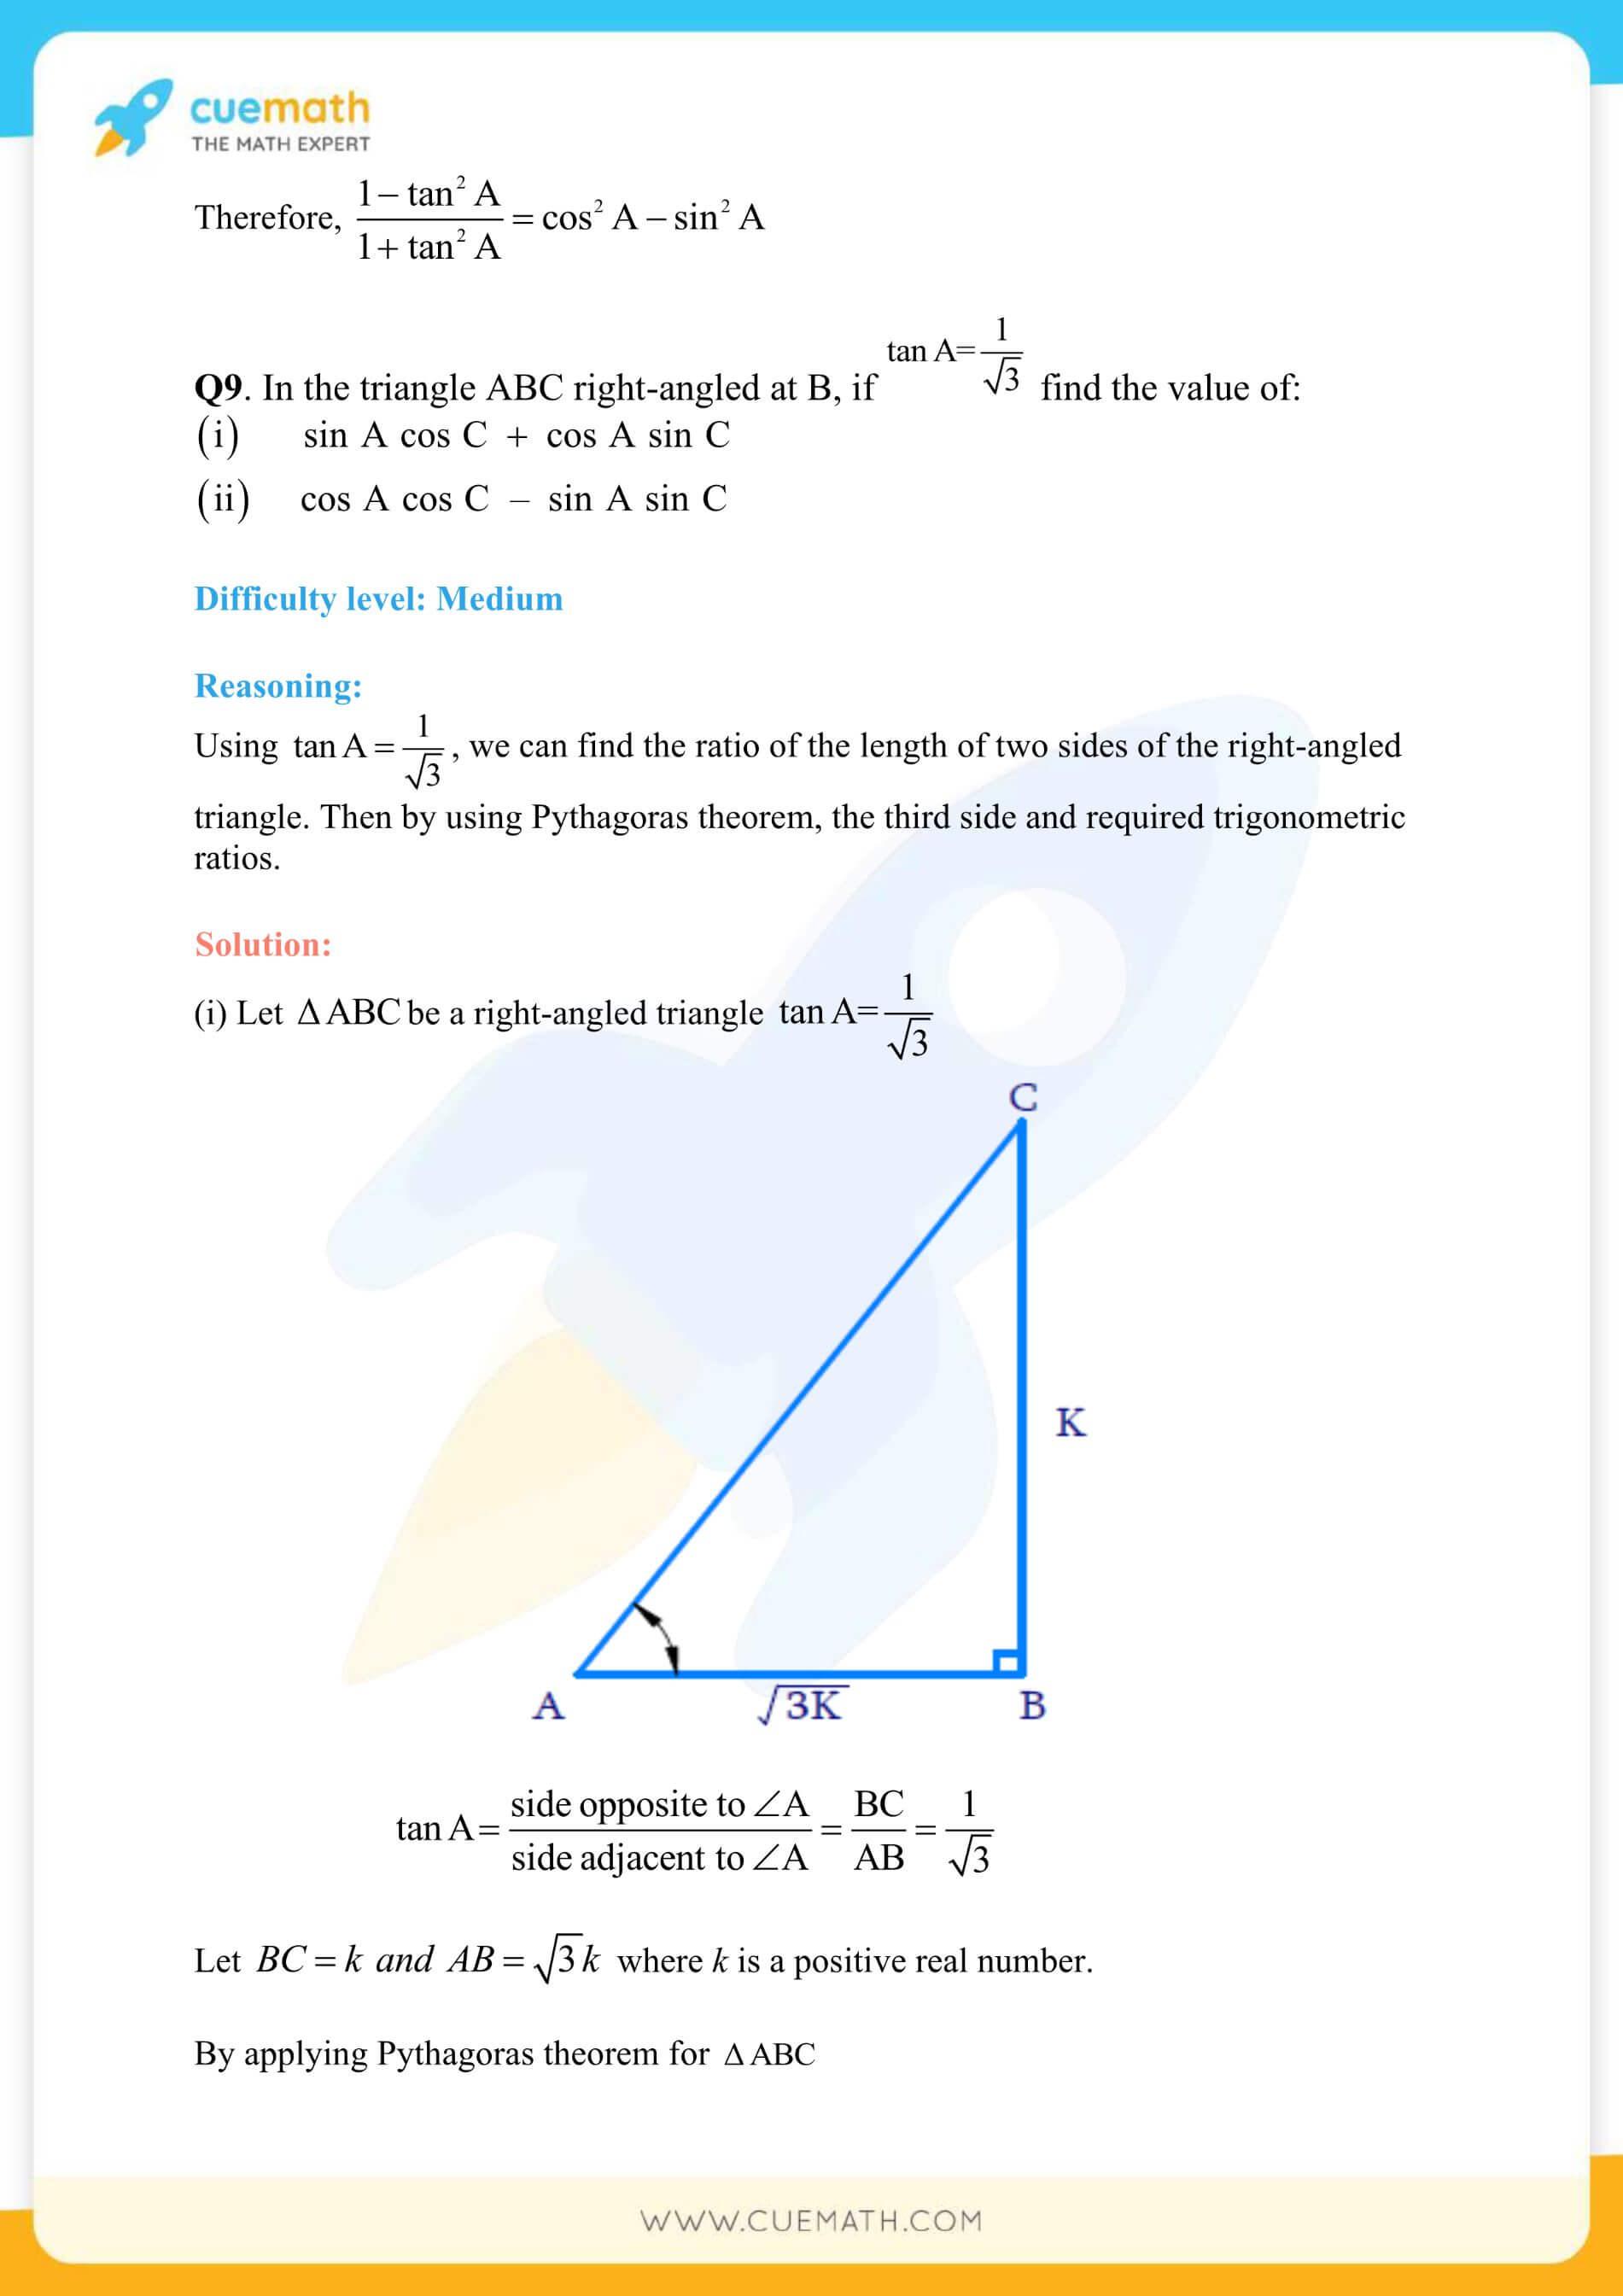 NCERT Solutions Class 10 Maths Chapter 8 Exercise 8.1 16